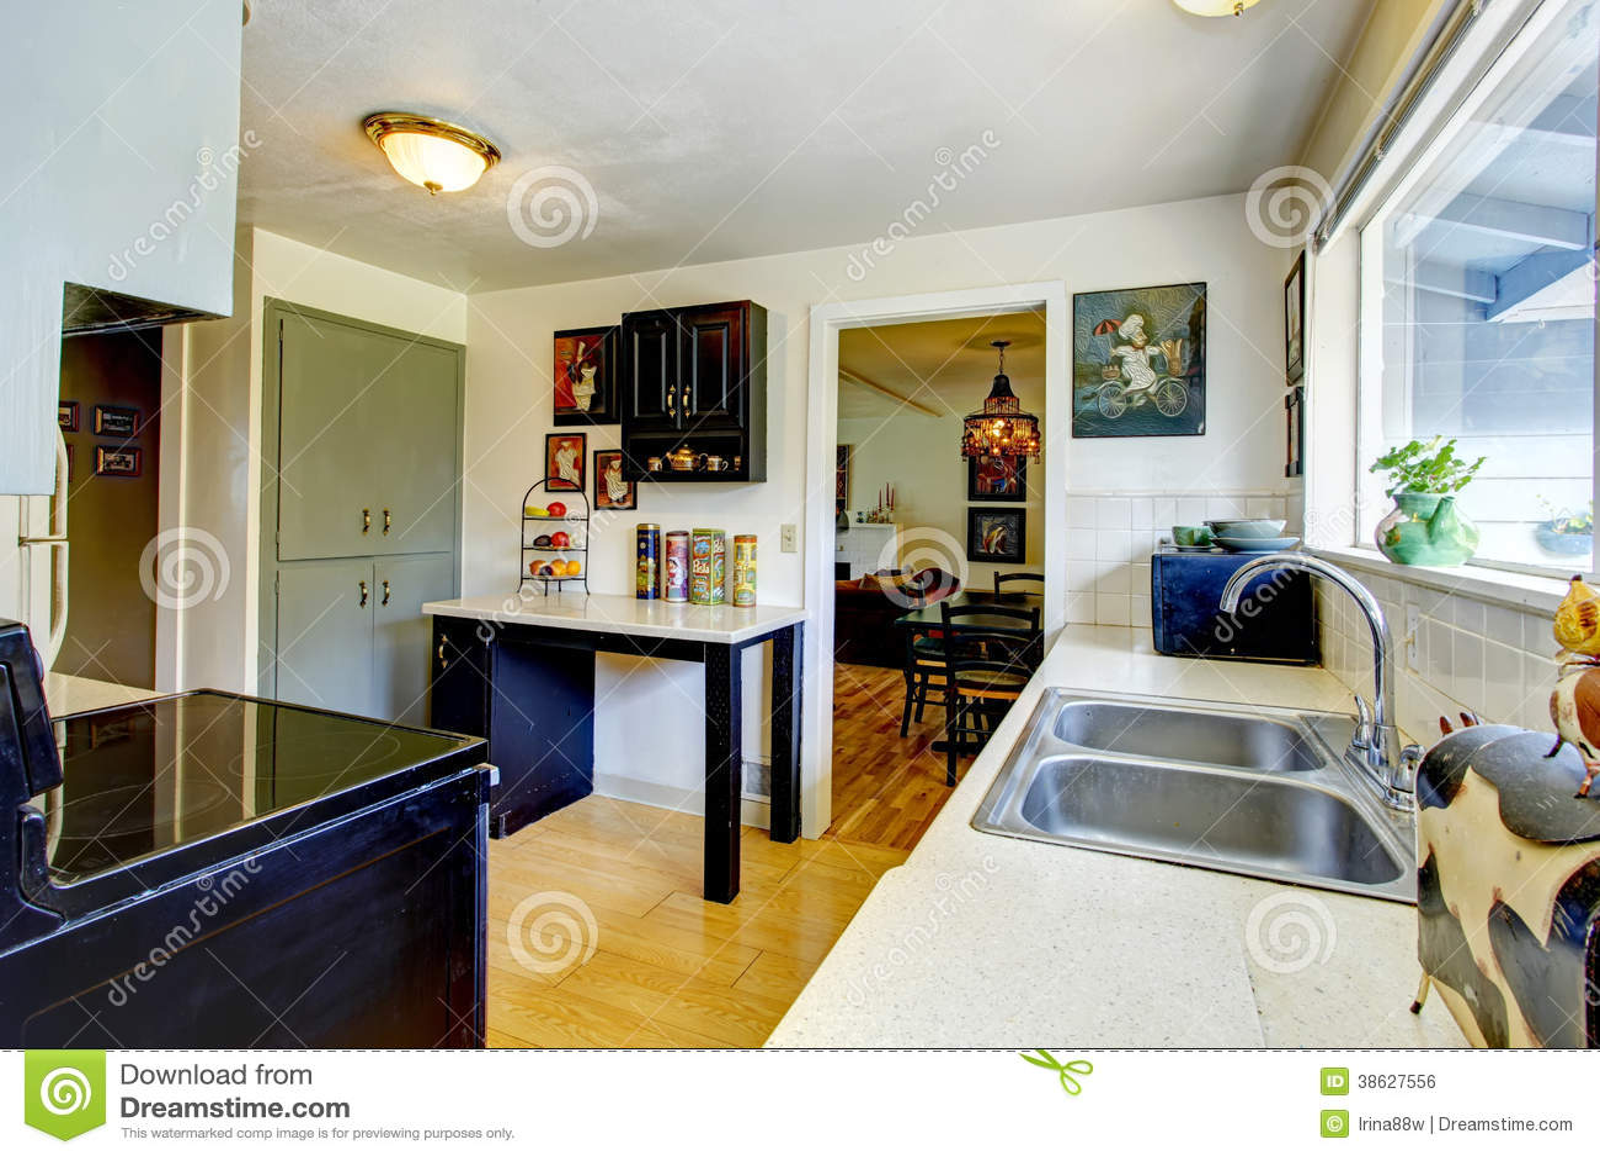 De oude ruimte van de manier kleine keuken stock foto afbeelding 38627556 - Ruimte van water kleine ruimte ...